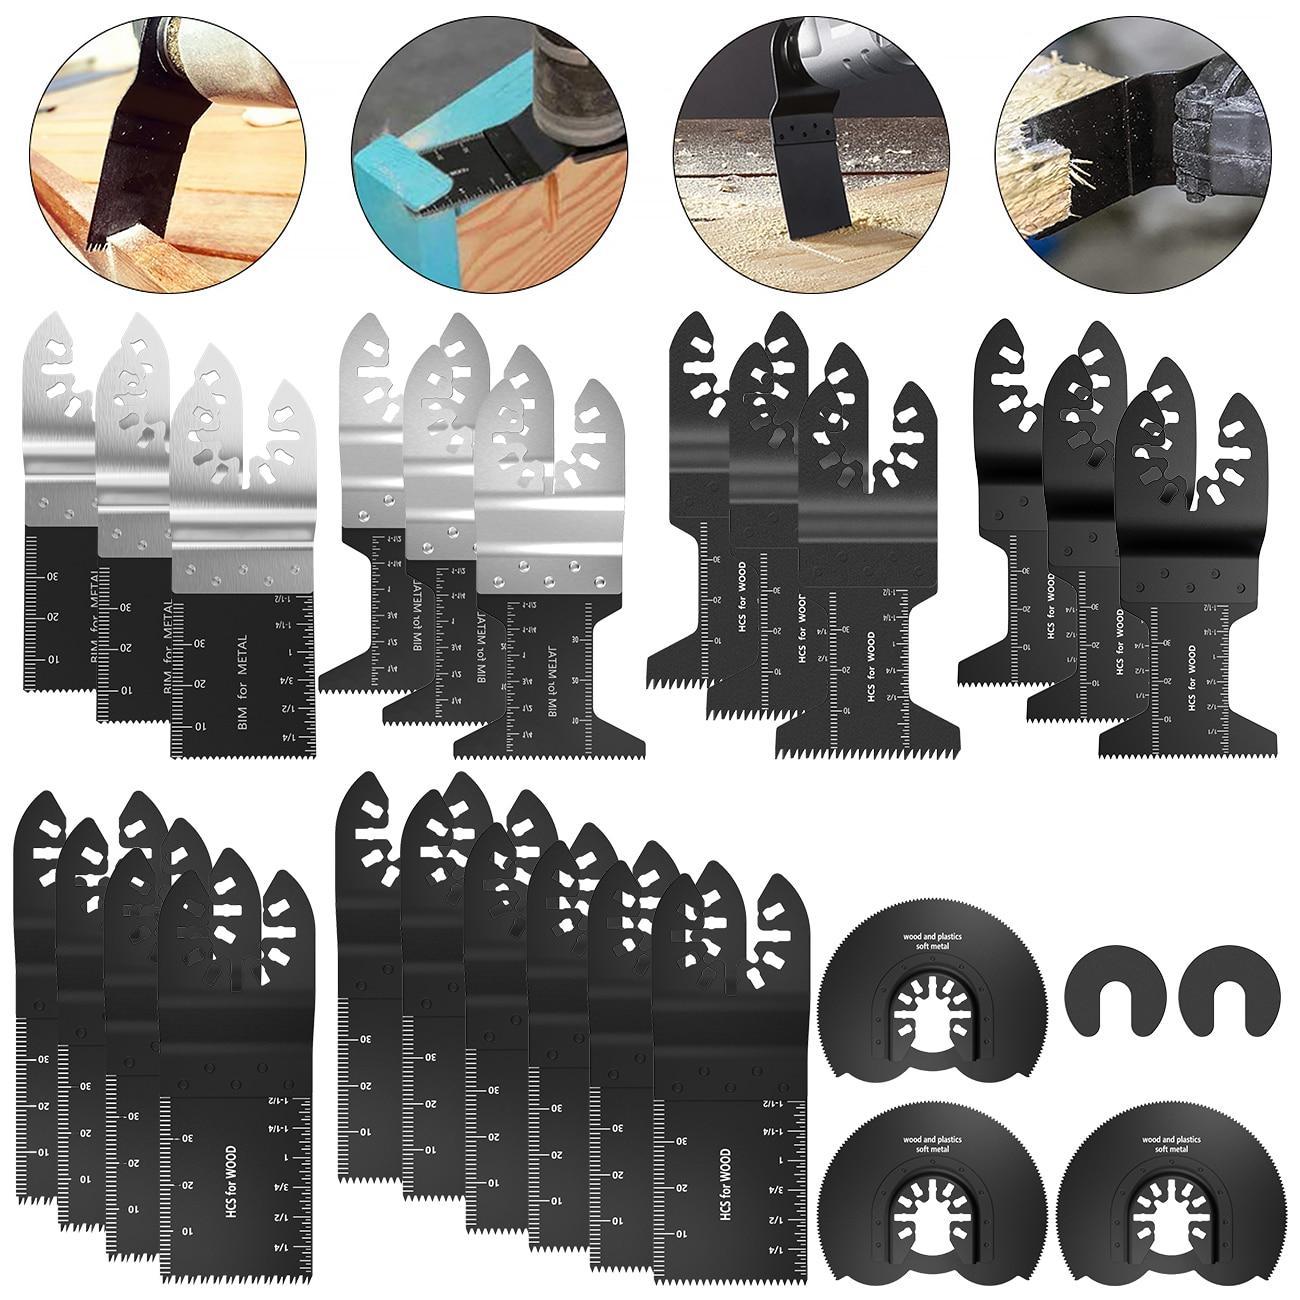 27Pcs Multi-Function Bi-metal Precision Saw Blade Oscillating Multitool Saw Blade For Renovator Power Cutting Multimaster Tools